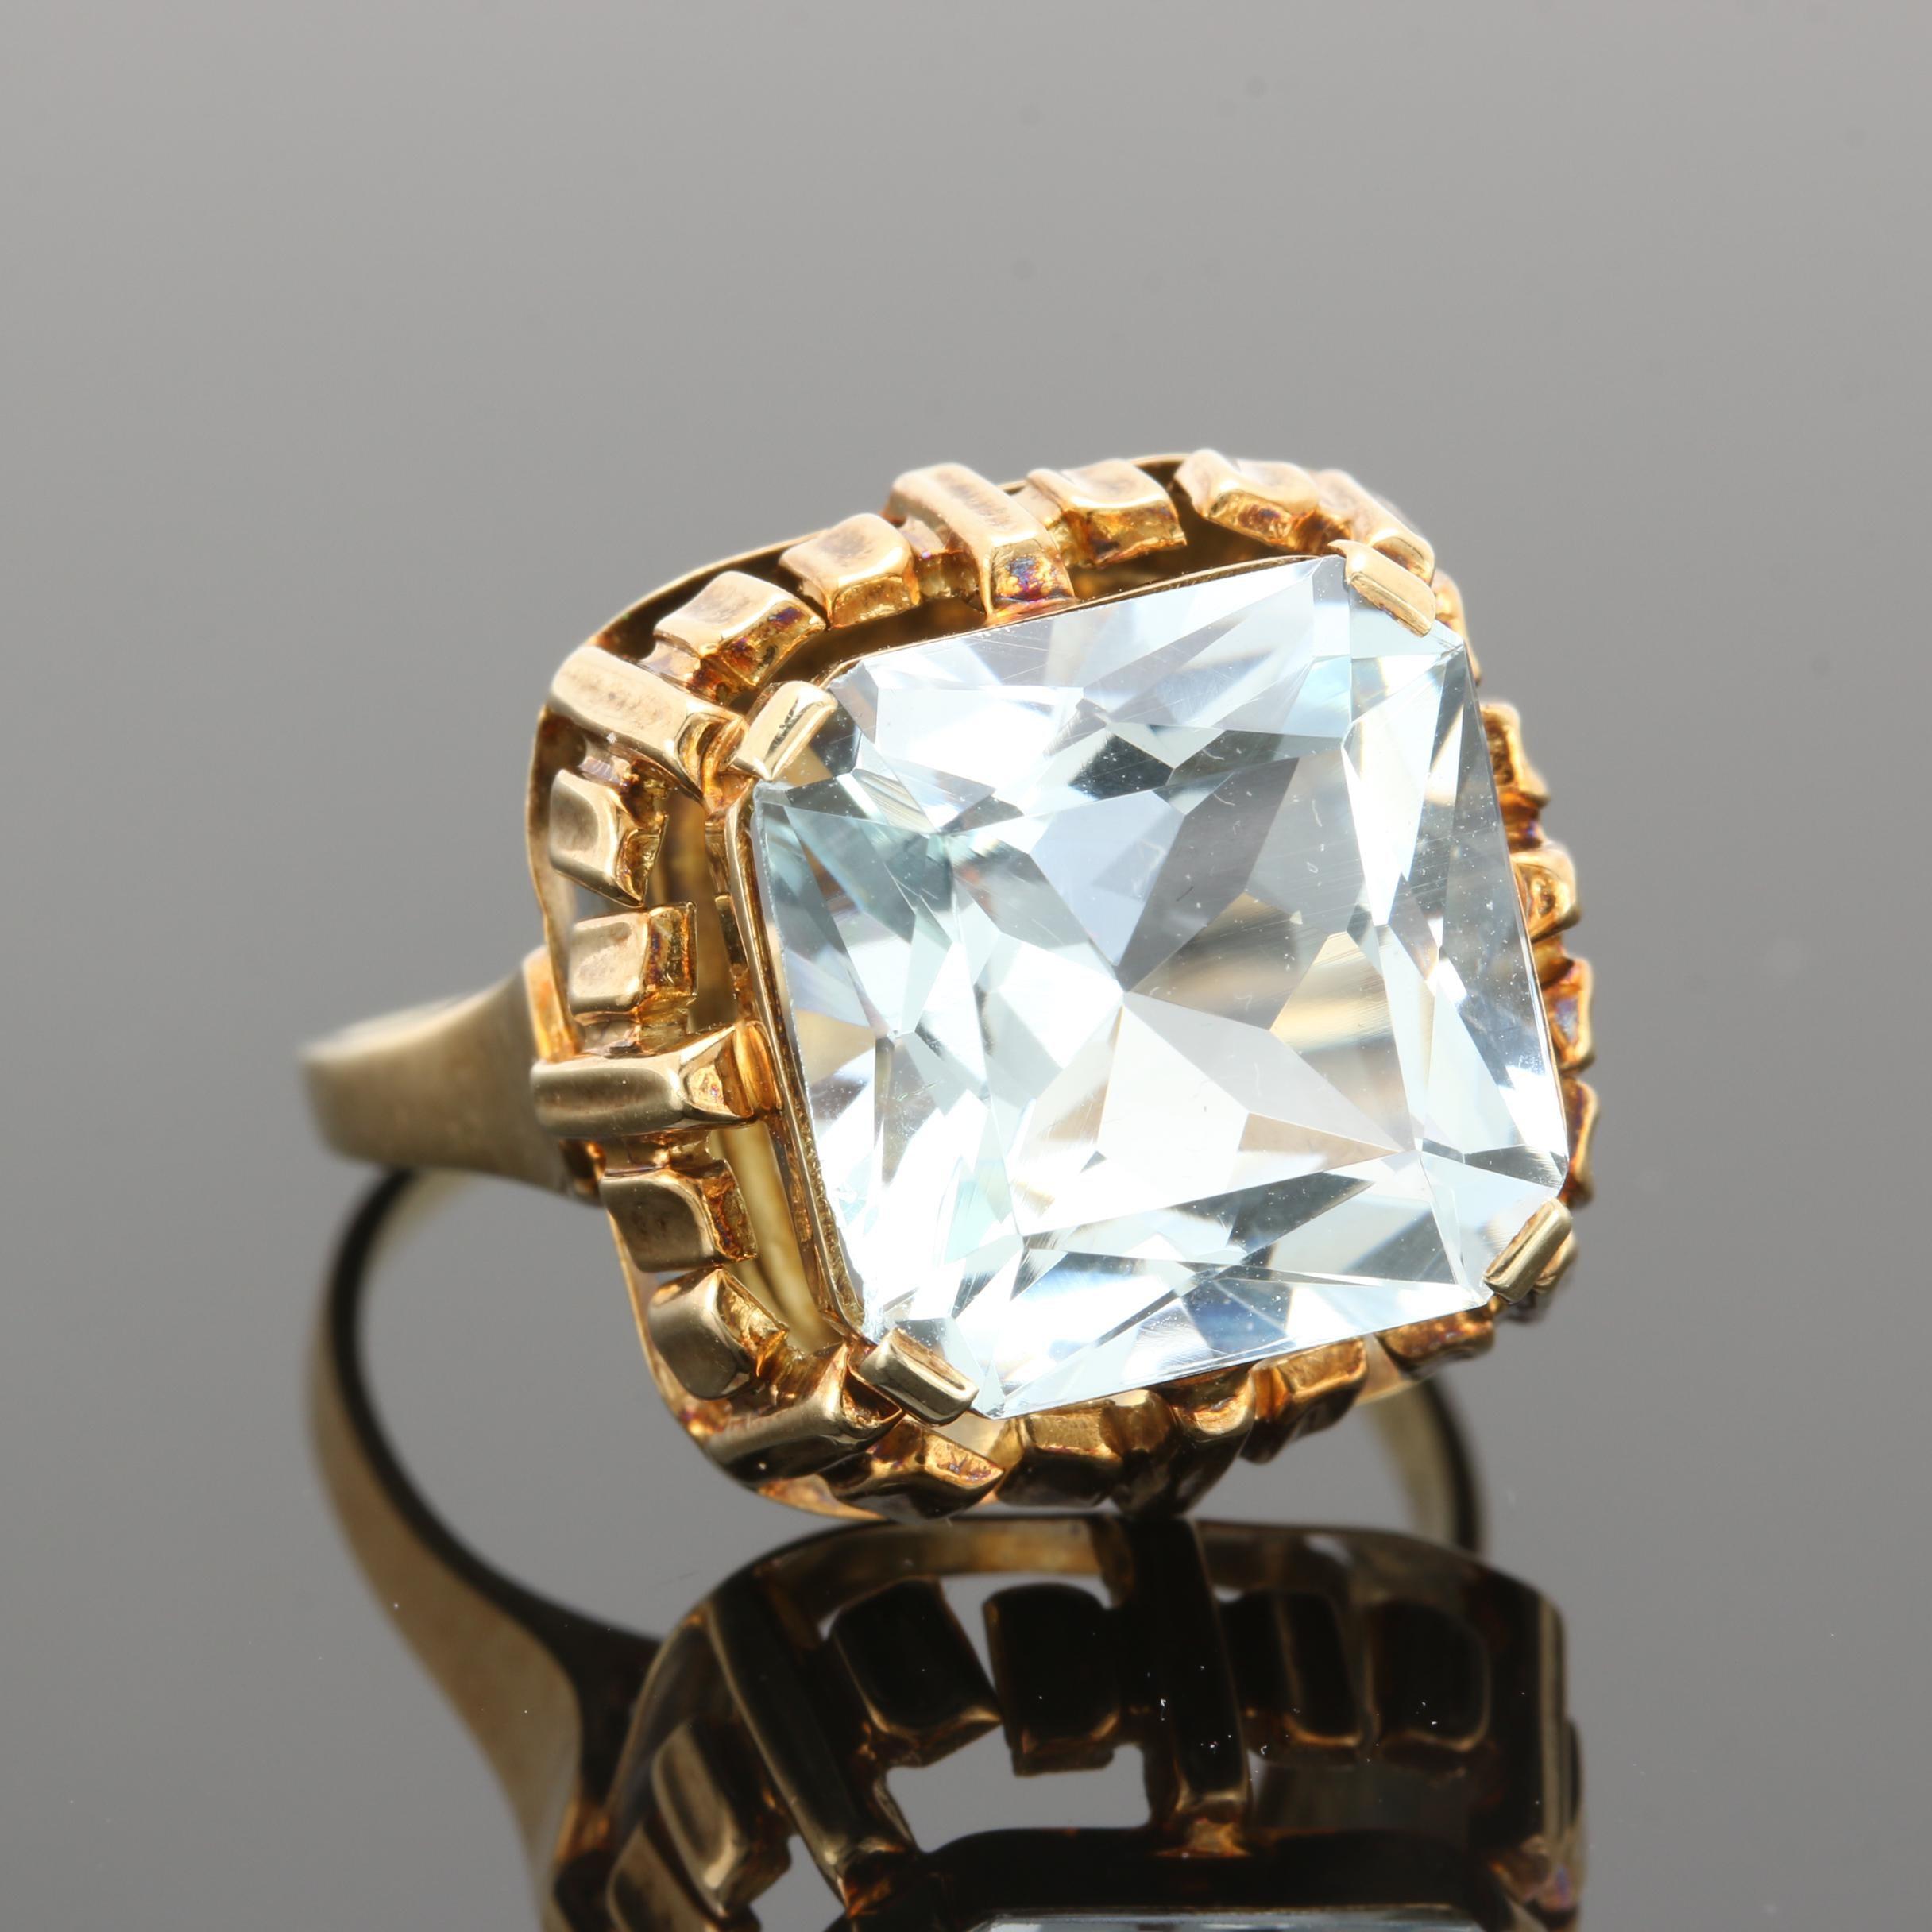 Circa 1960 - 1970 14K Yellow Gold 7.25 CT Aquamarine Ring